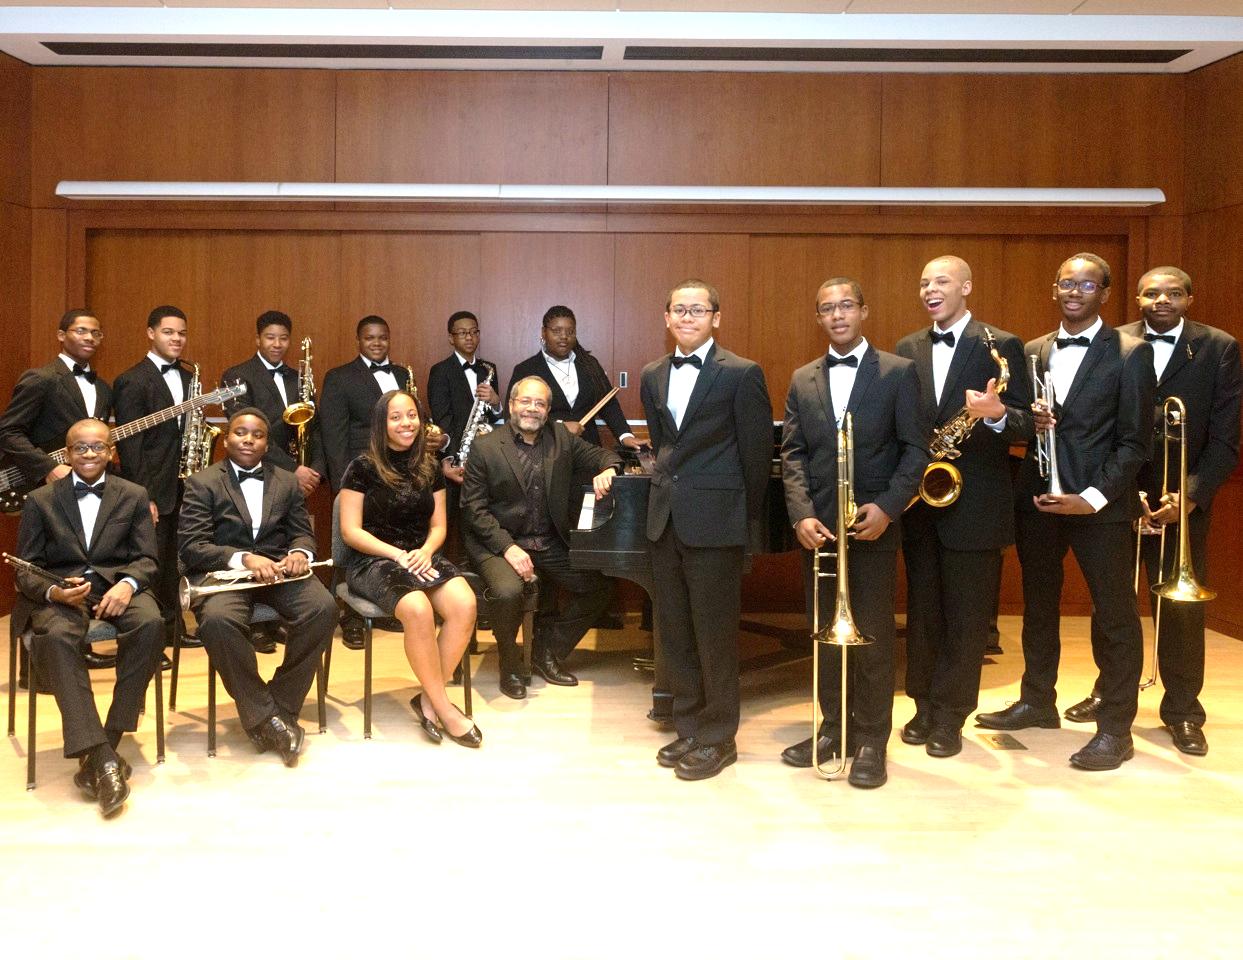 FAME Jazz Band, Washington, D.C. Photographer Gwen Flowers